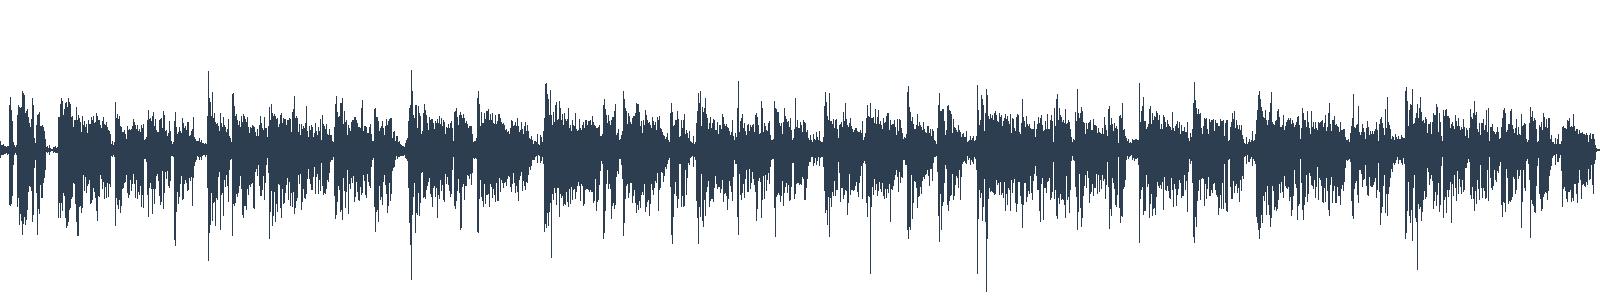 Nové audioknihy 37/2019 waveform